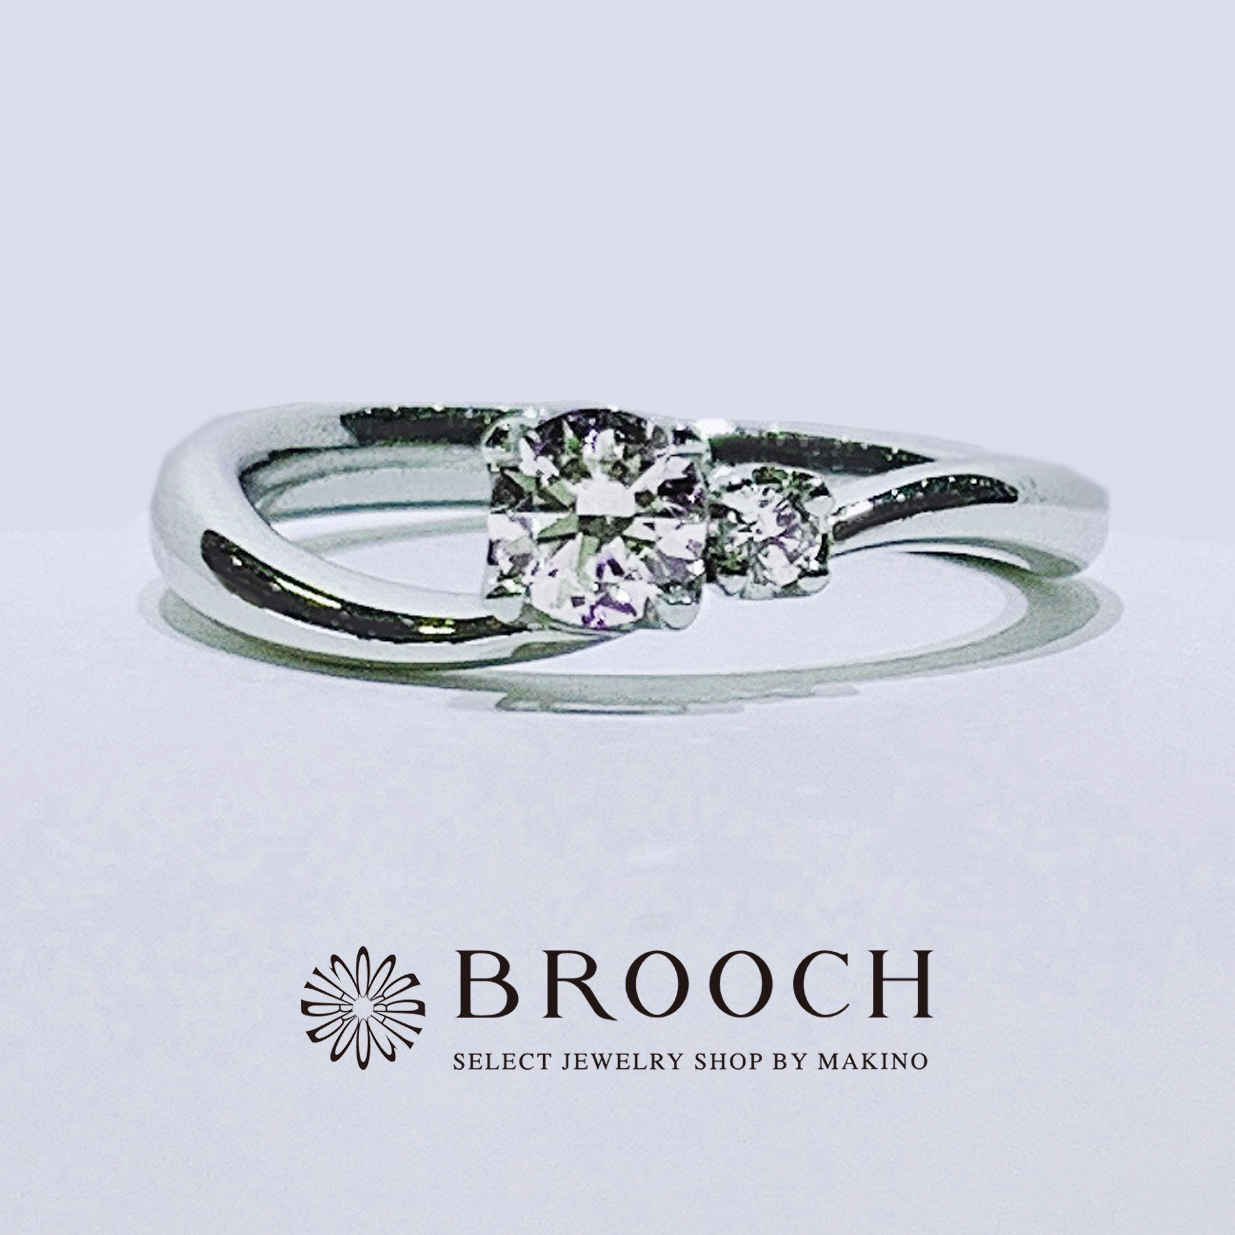 BROOCH 婚約指輪 エンゲージリング シンプルウェーブデザイン